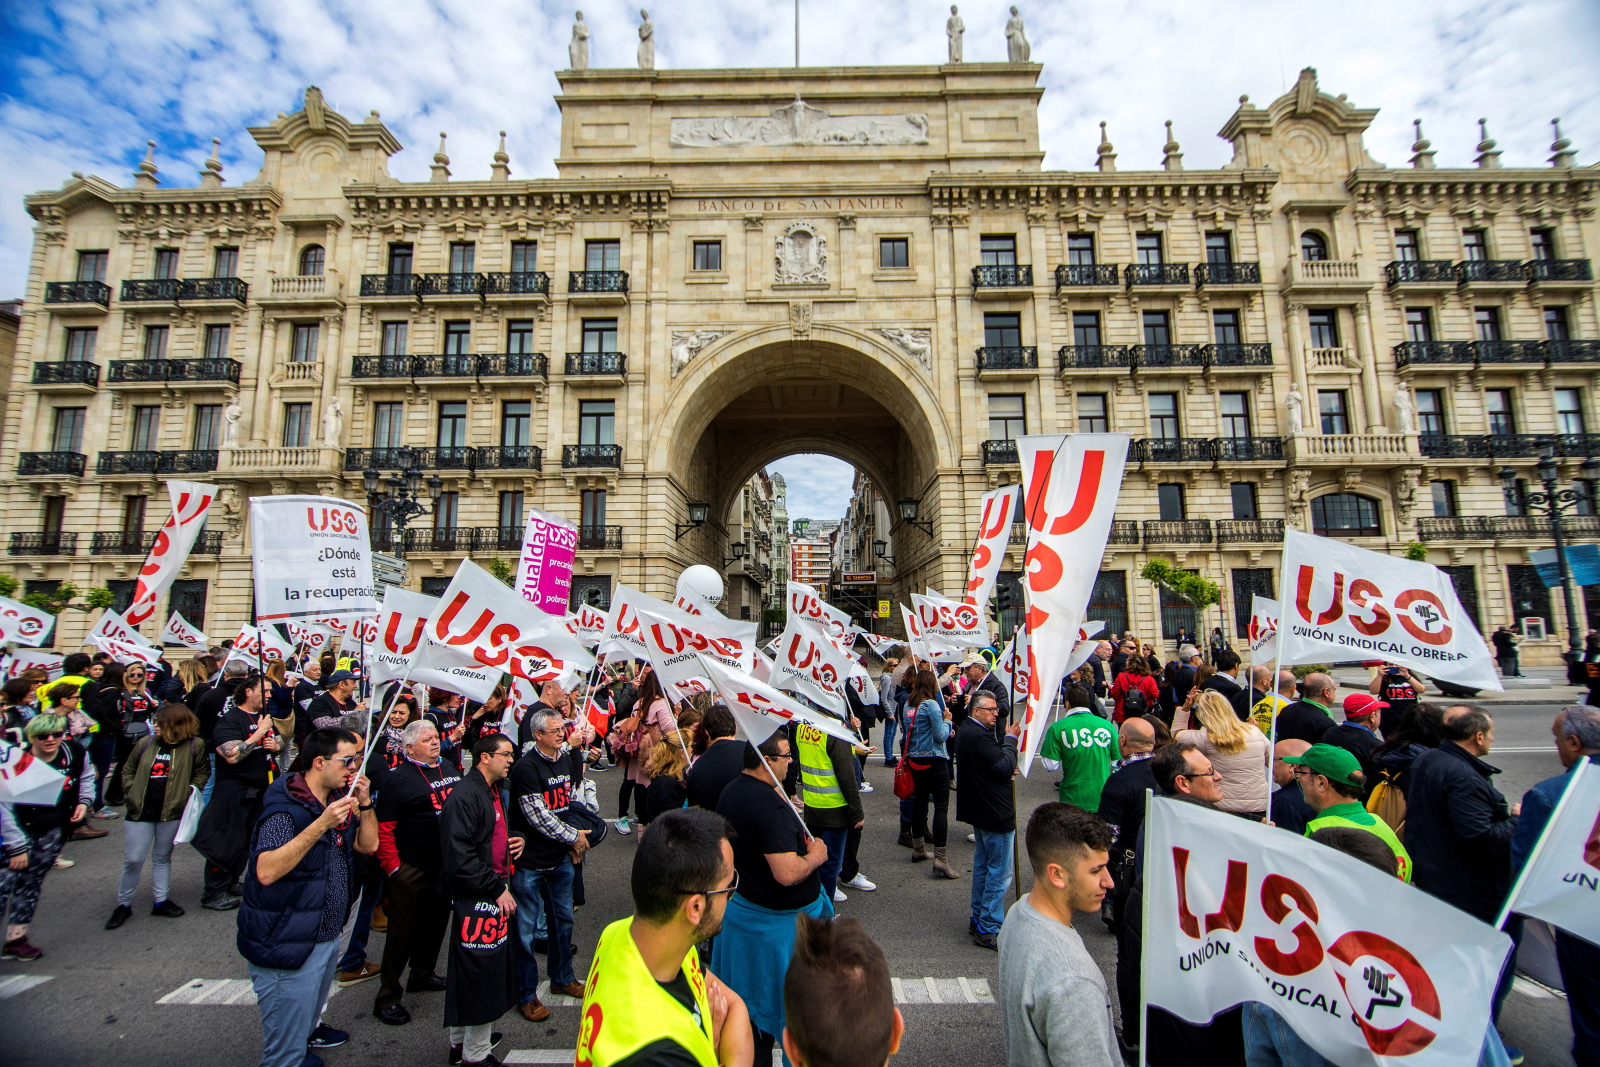 Święto Pracy w Hiszpanii EPA/Roman G. Aguilera